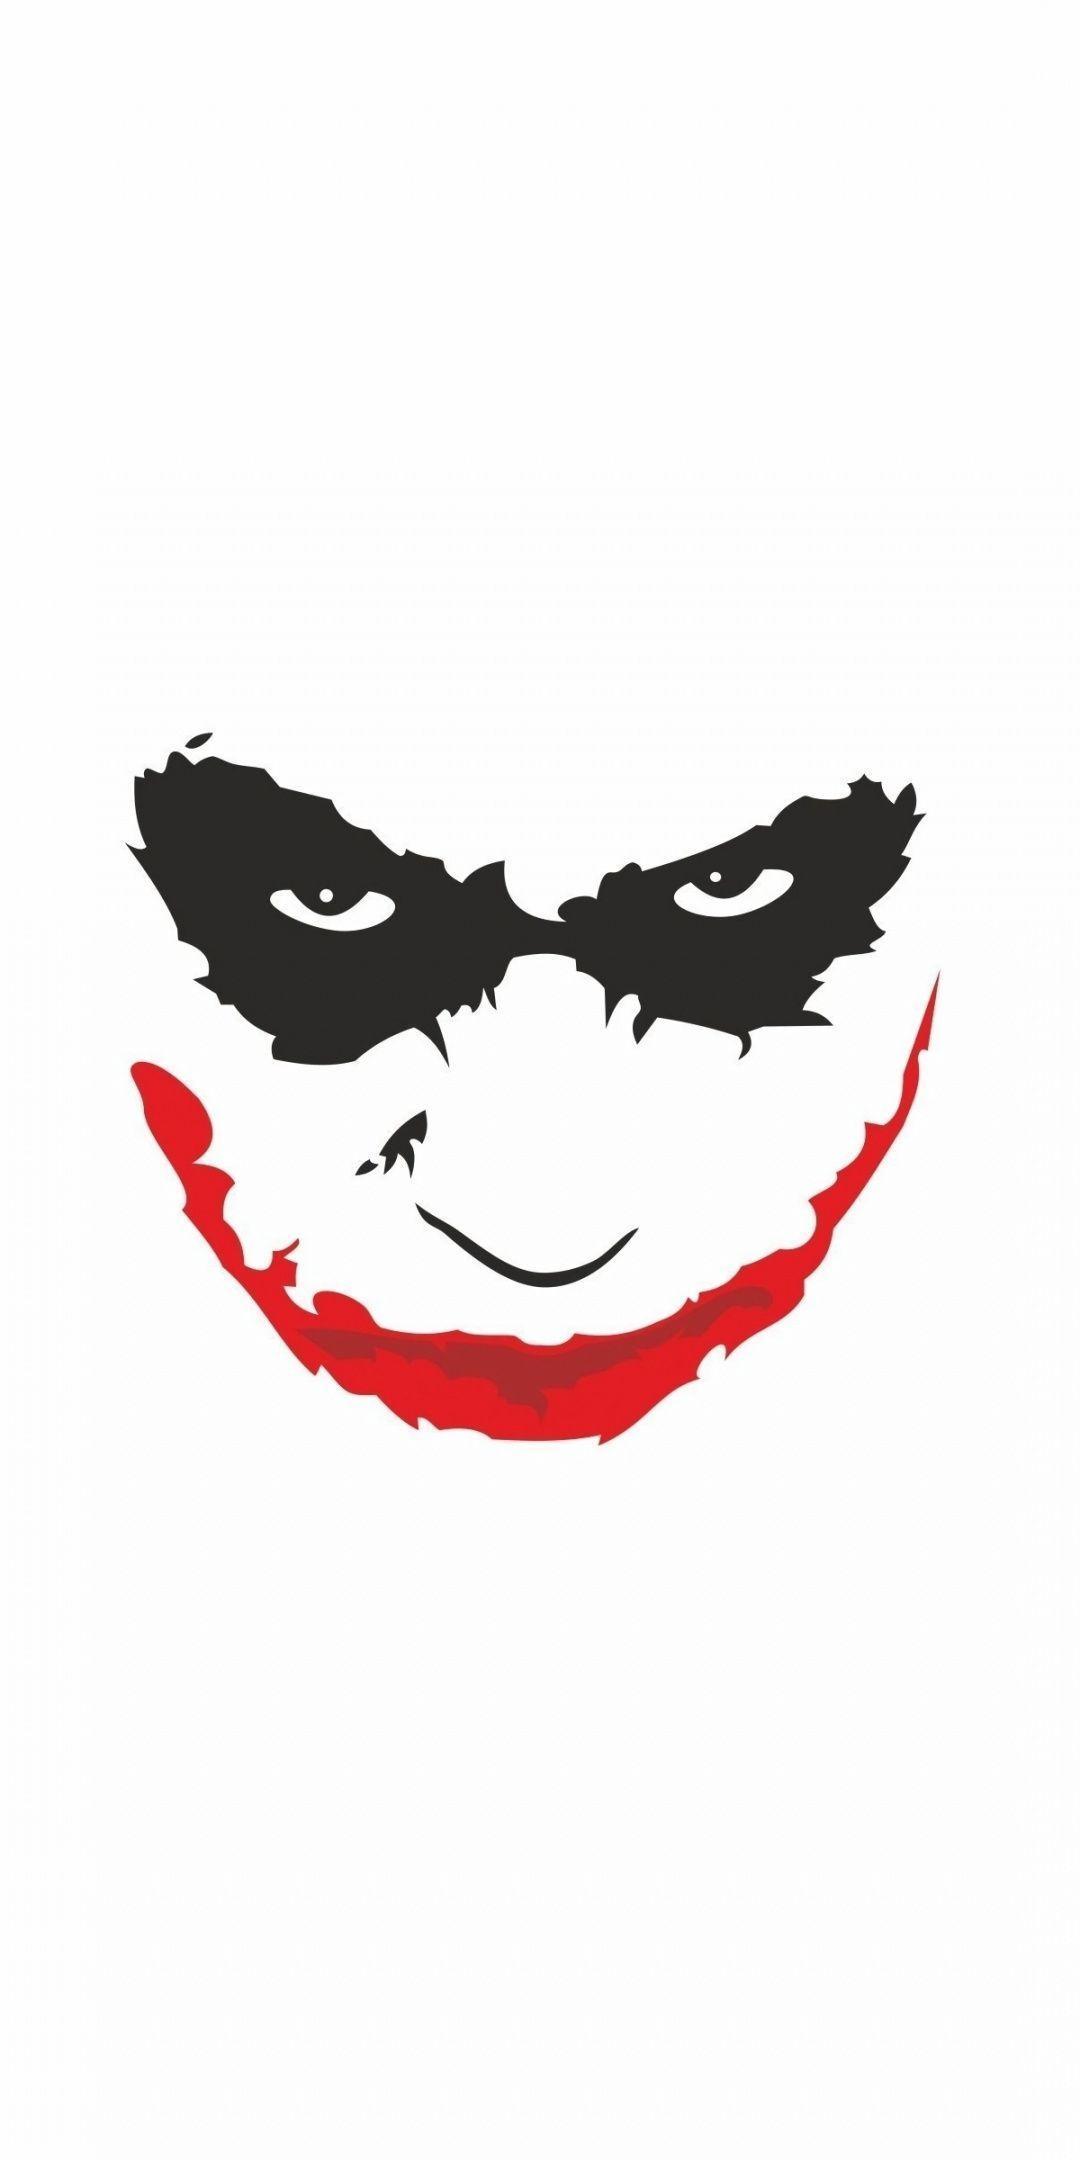 Joker Drawing Wallpapers Top Free Joker Drawing Backgrounds Wallpaperaccess